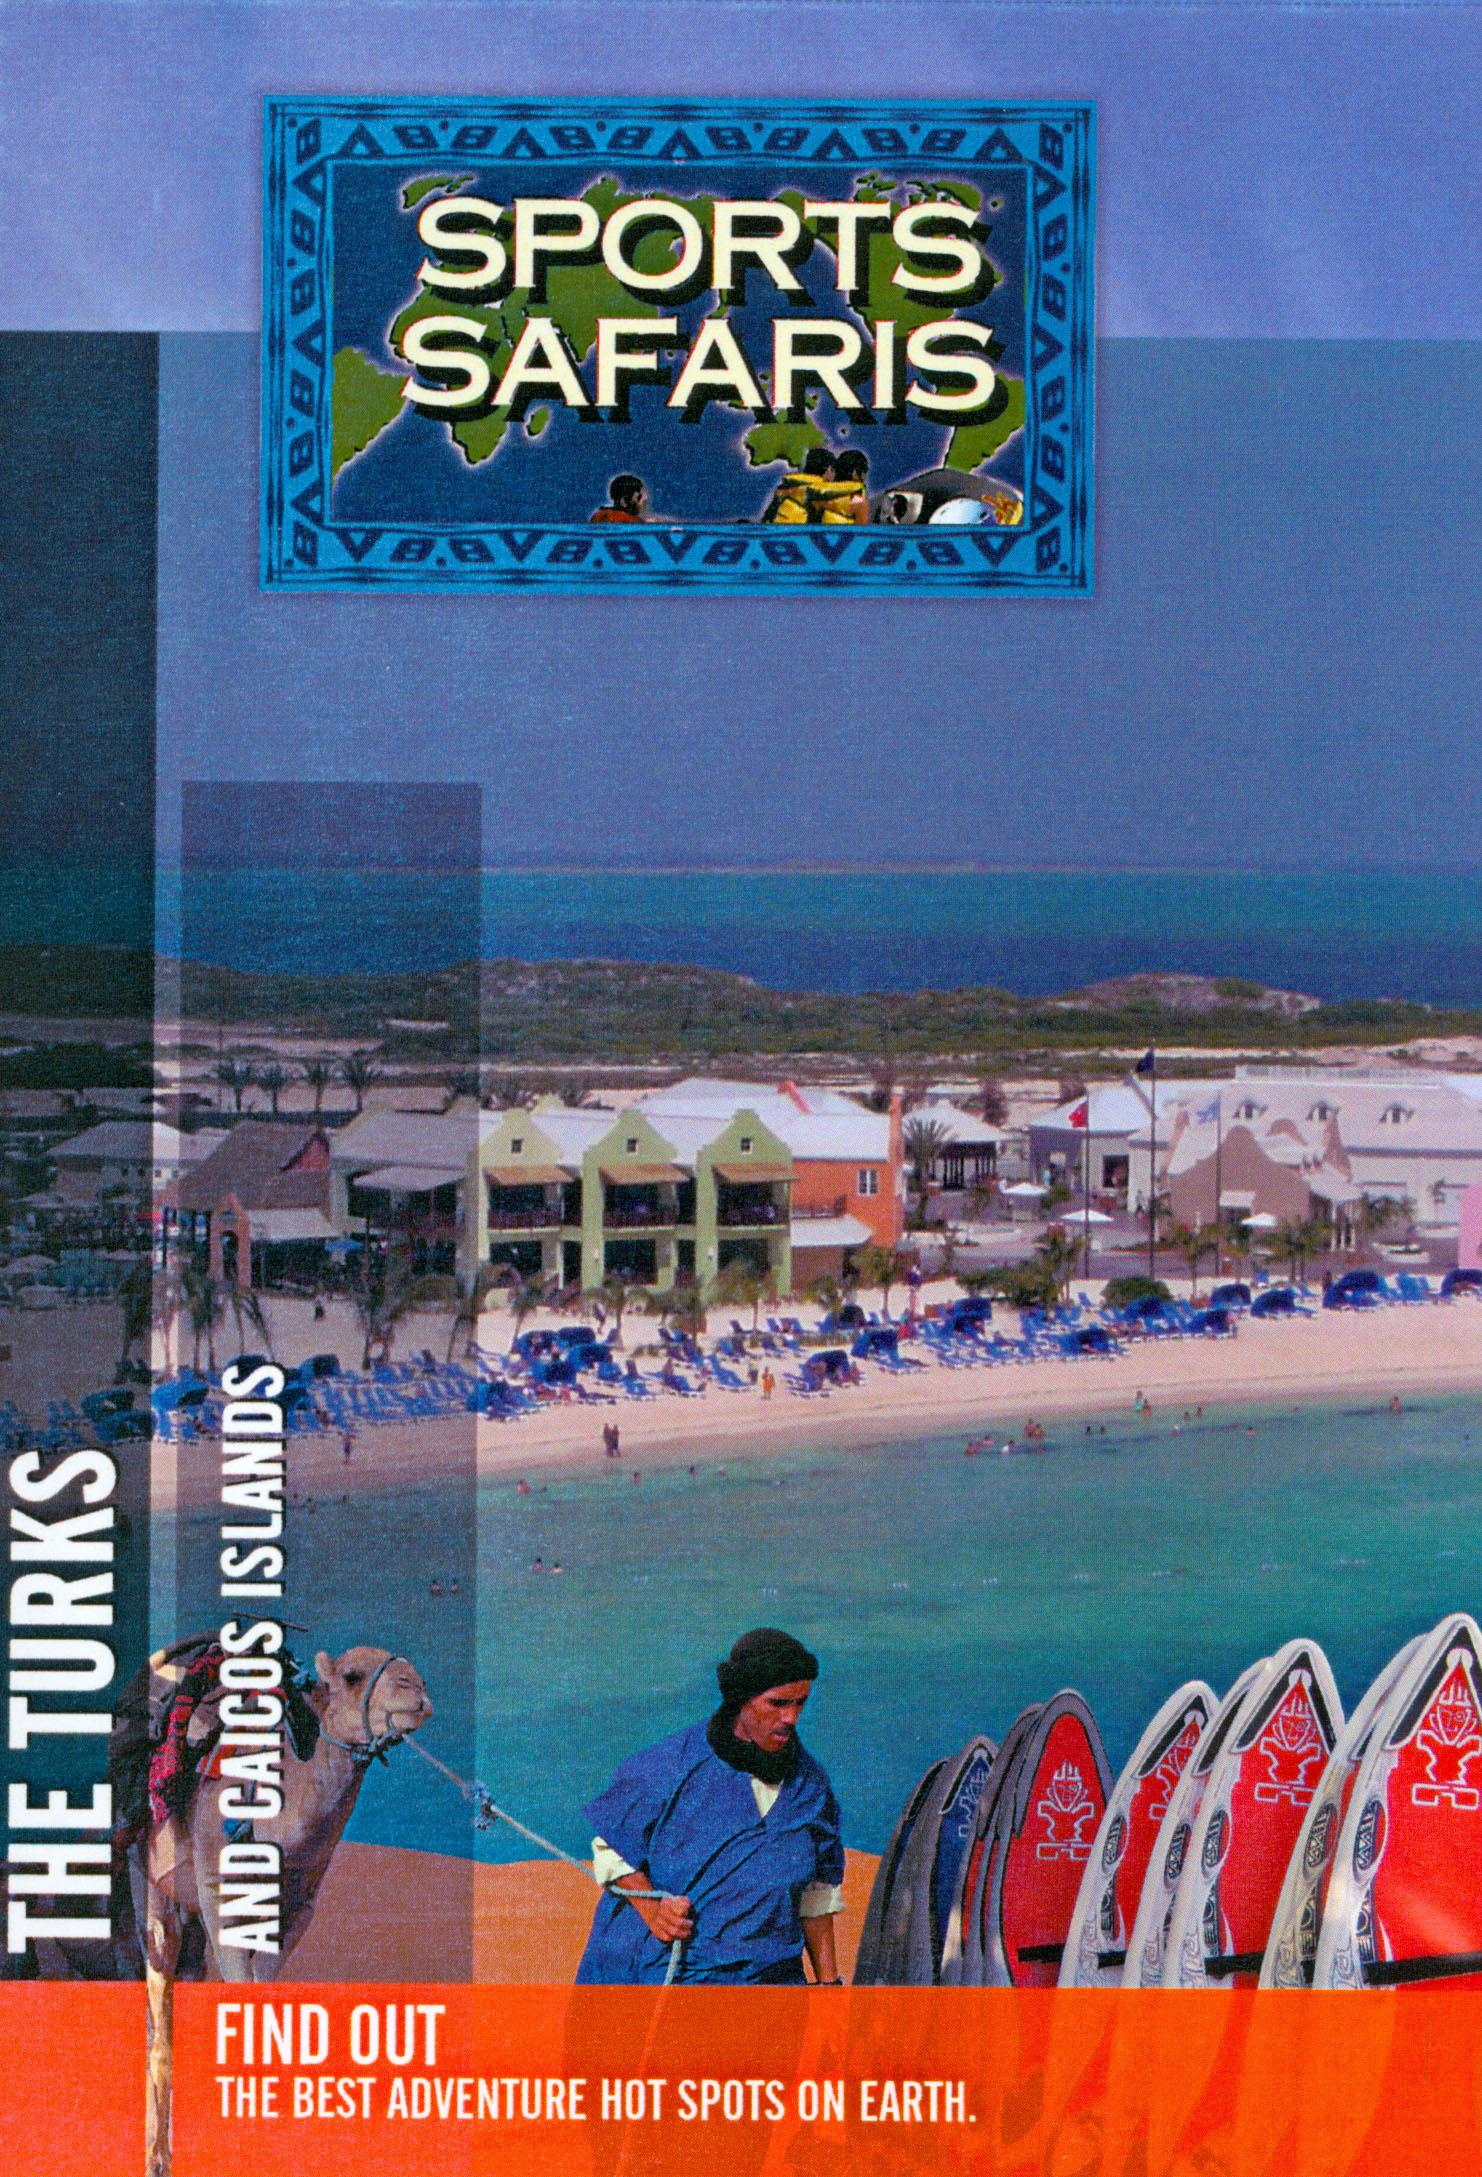 Sports Safaris: The Turks snd Caicos Islands